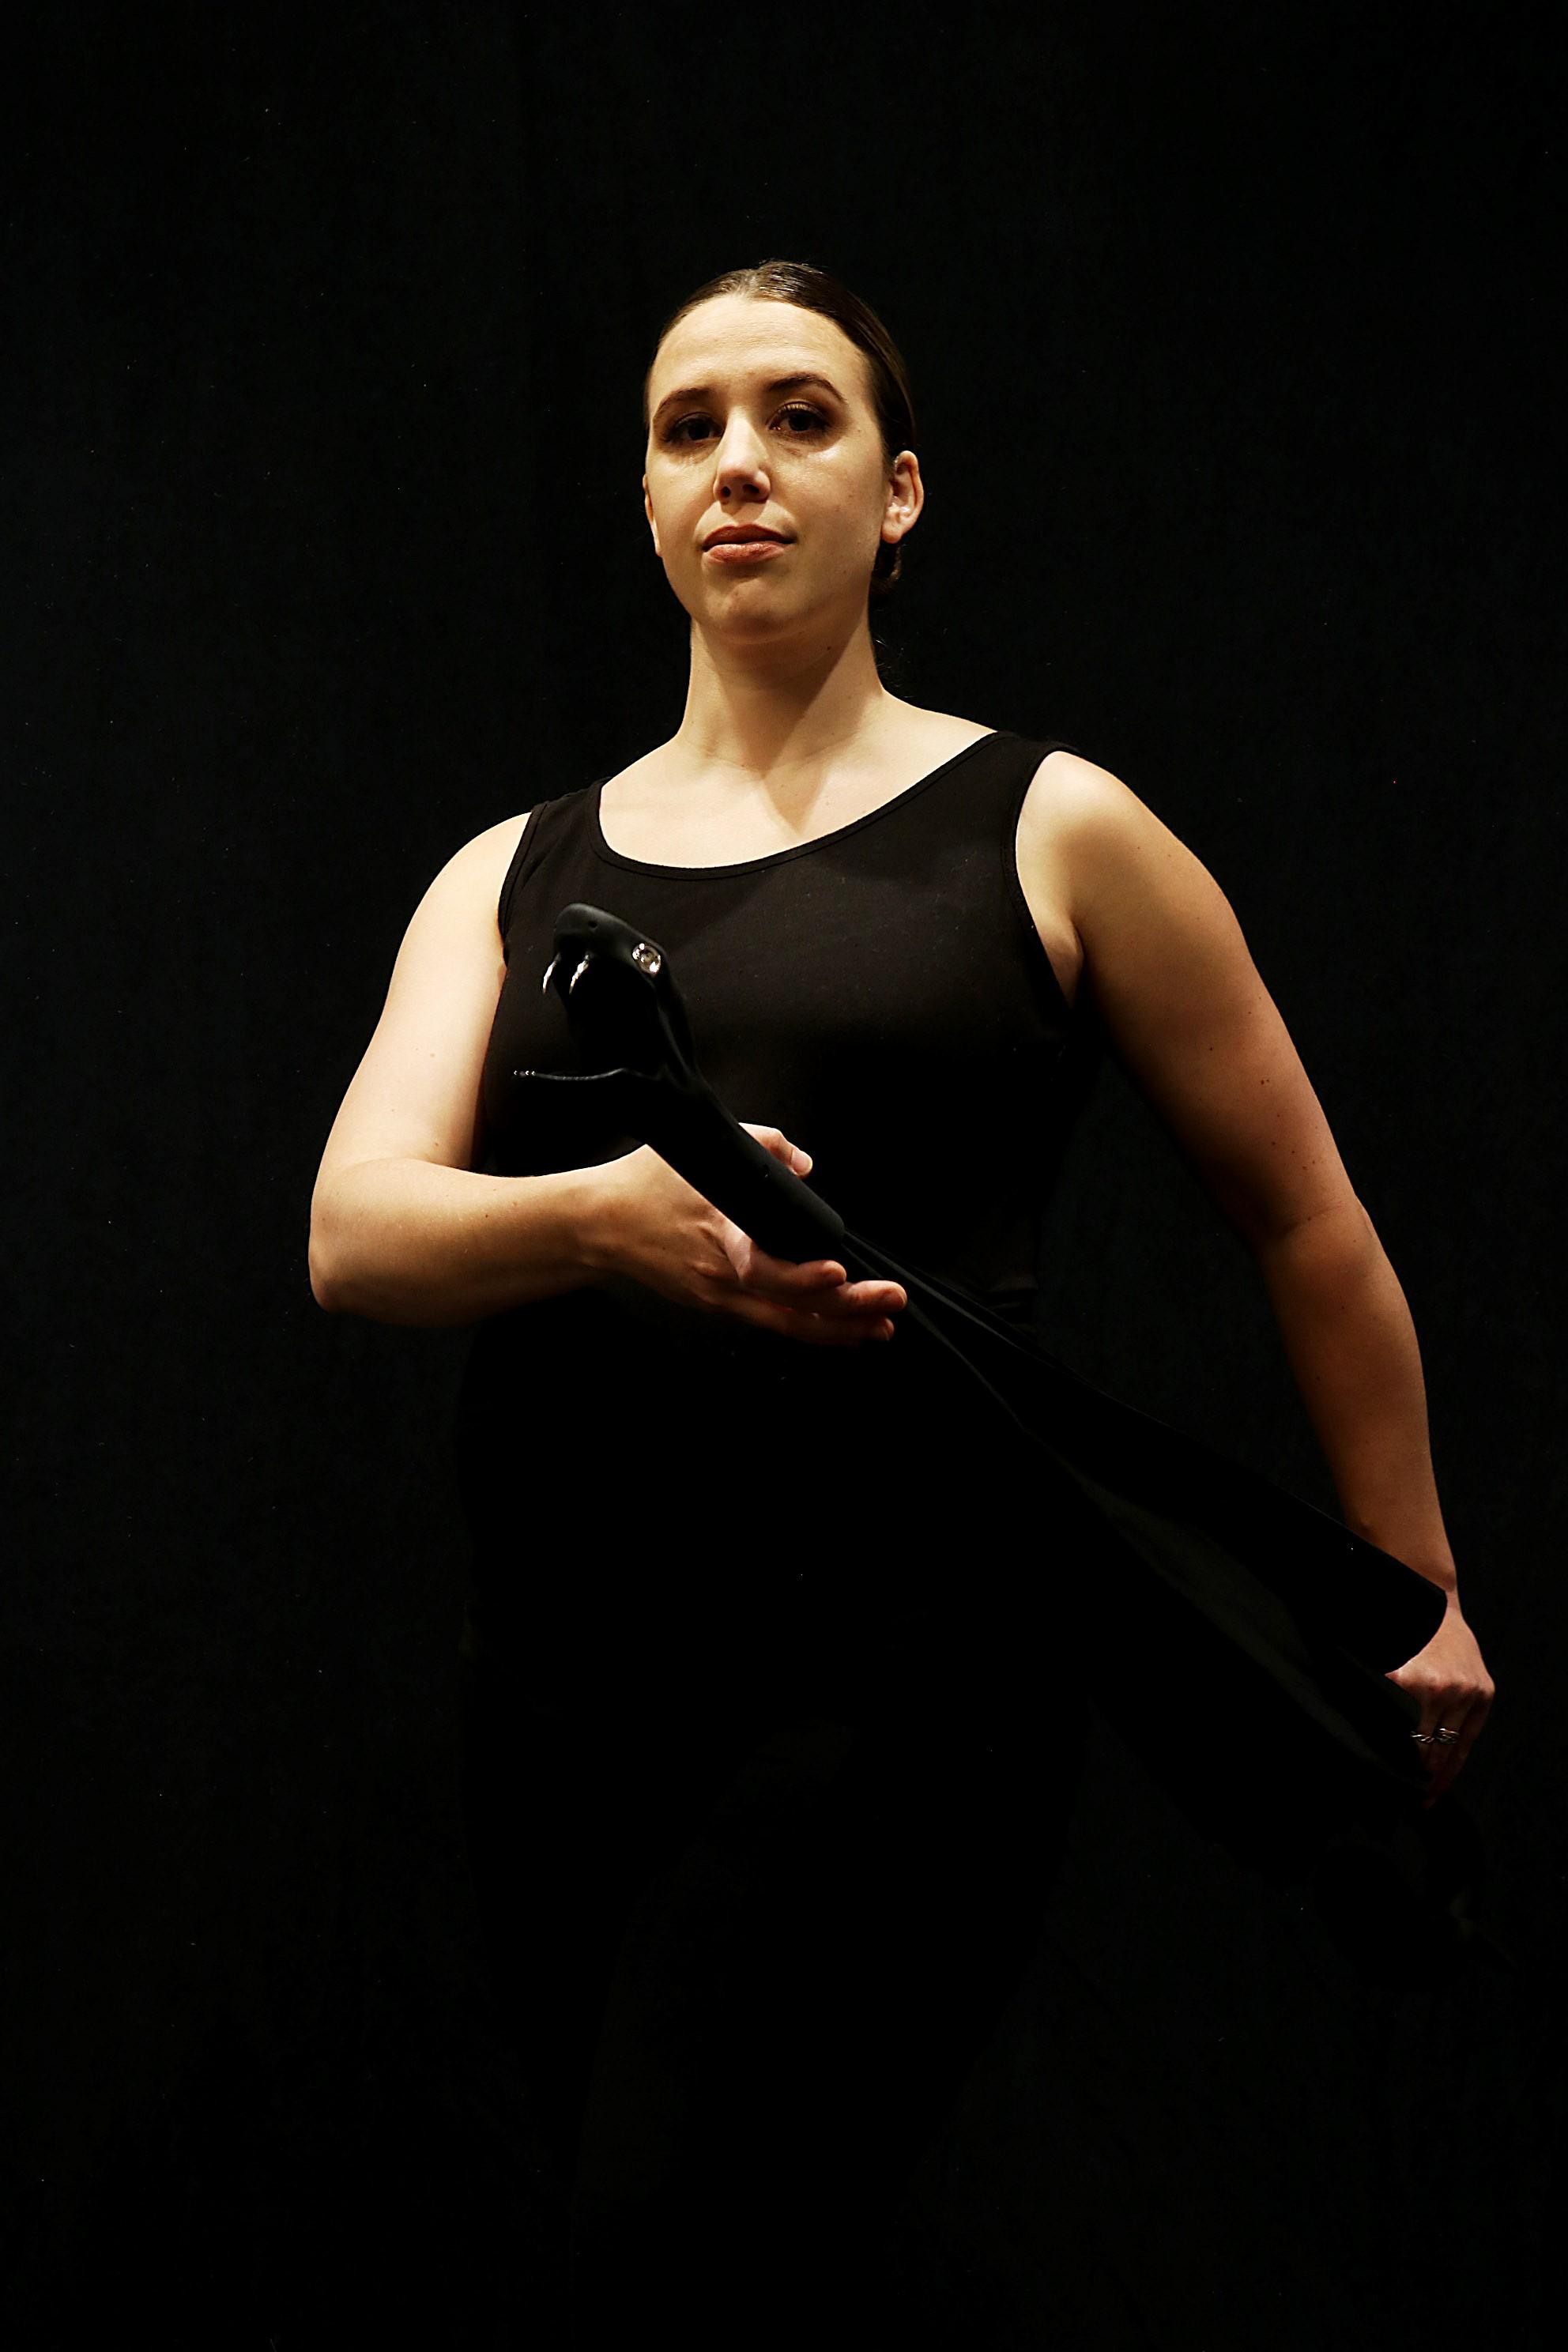 Emily Cobb   The Dreaded Gaze - Medusa and the Basilisk